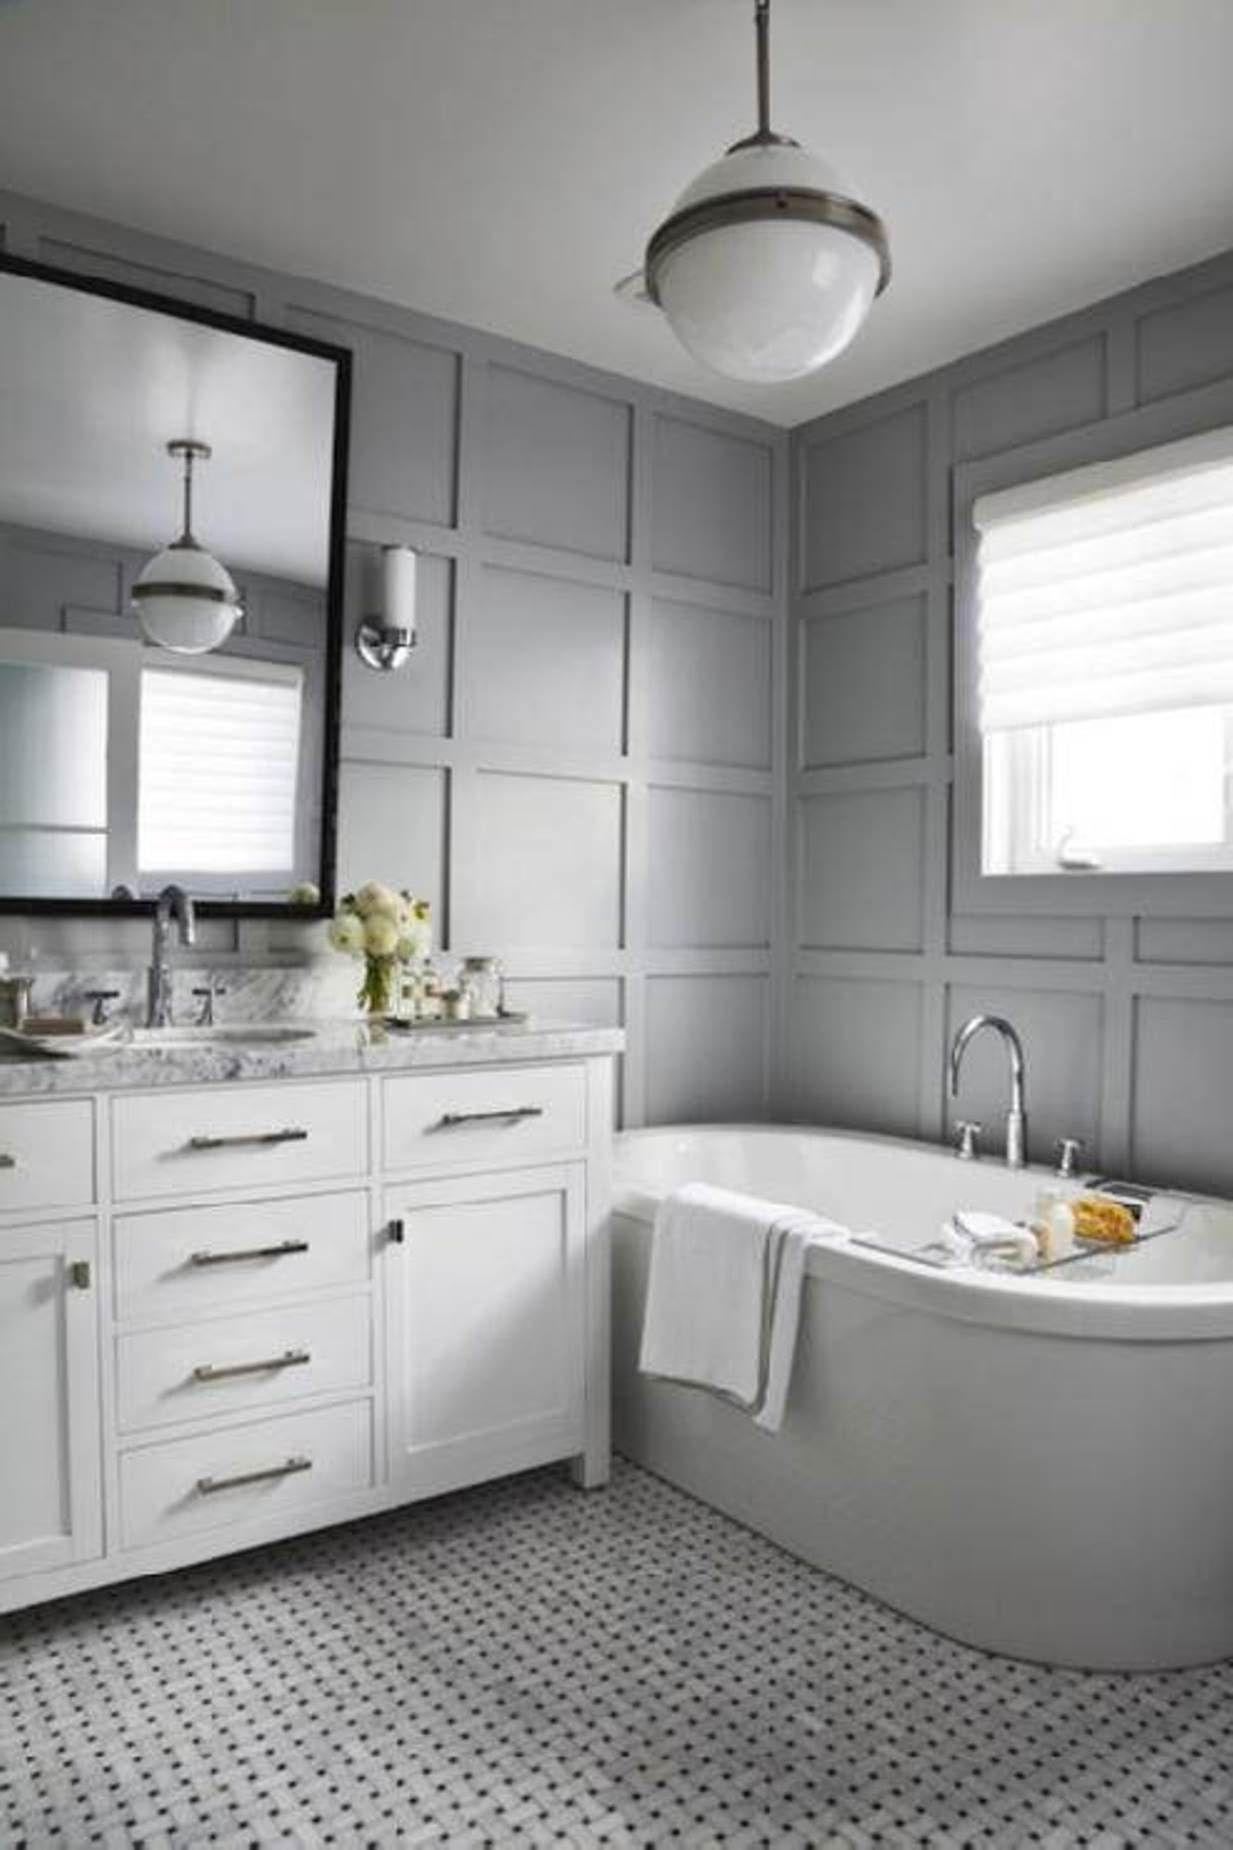 small space bathroom design ideas small space bathroom on amazing small bathroom designs and ideas id=58604